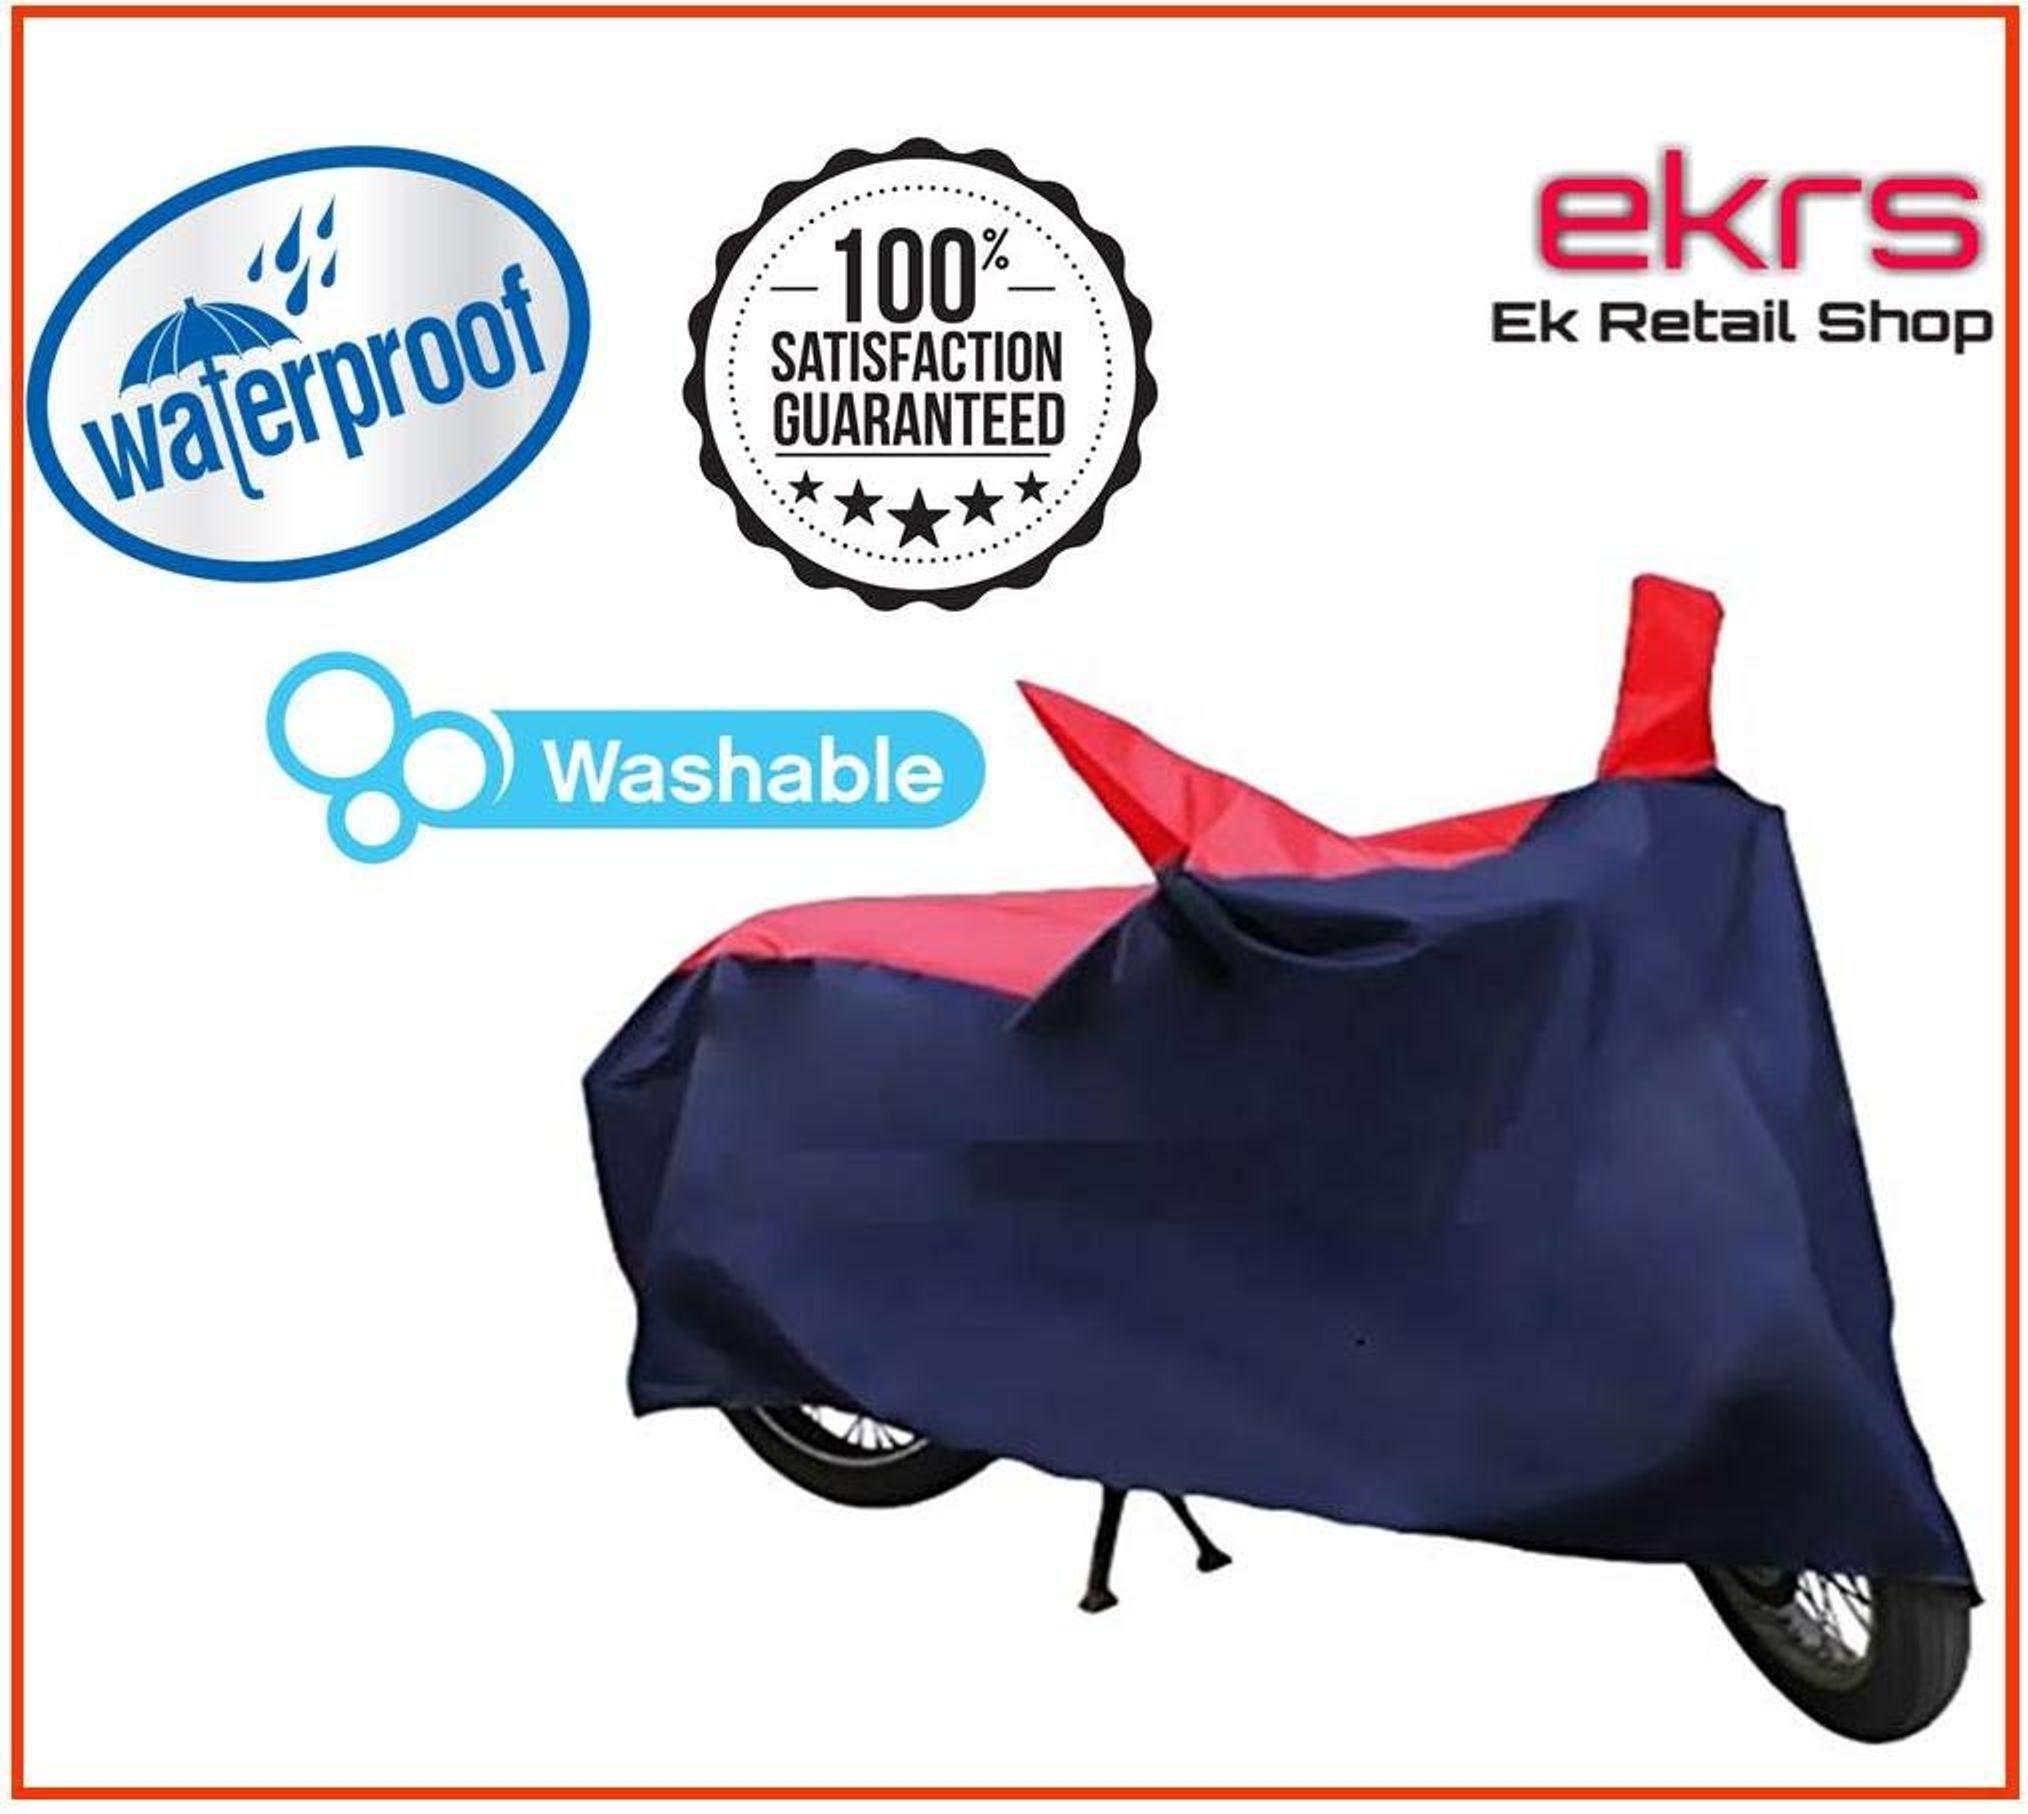 EKRS Nevy/Red Matty Waterproof Bike Body Cover for Harley Davidson CVO Limited